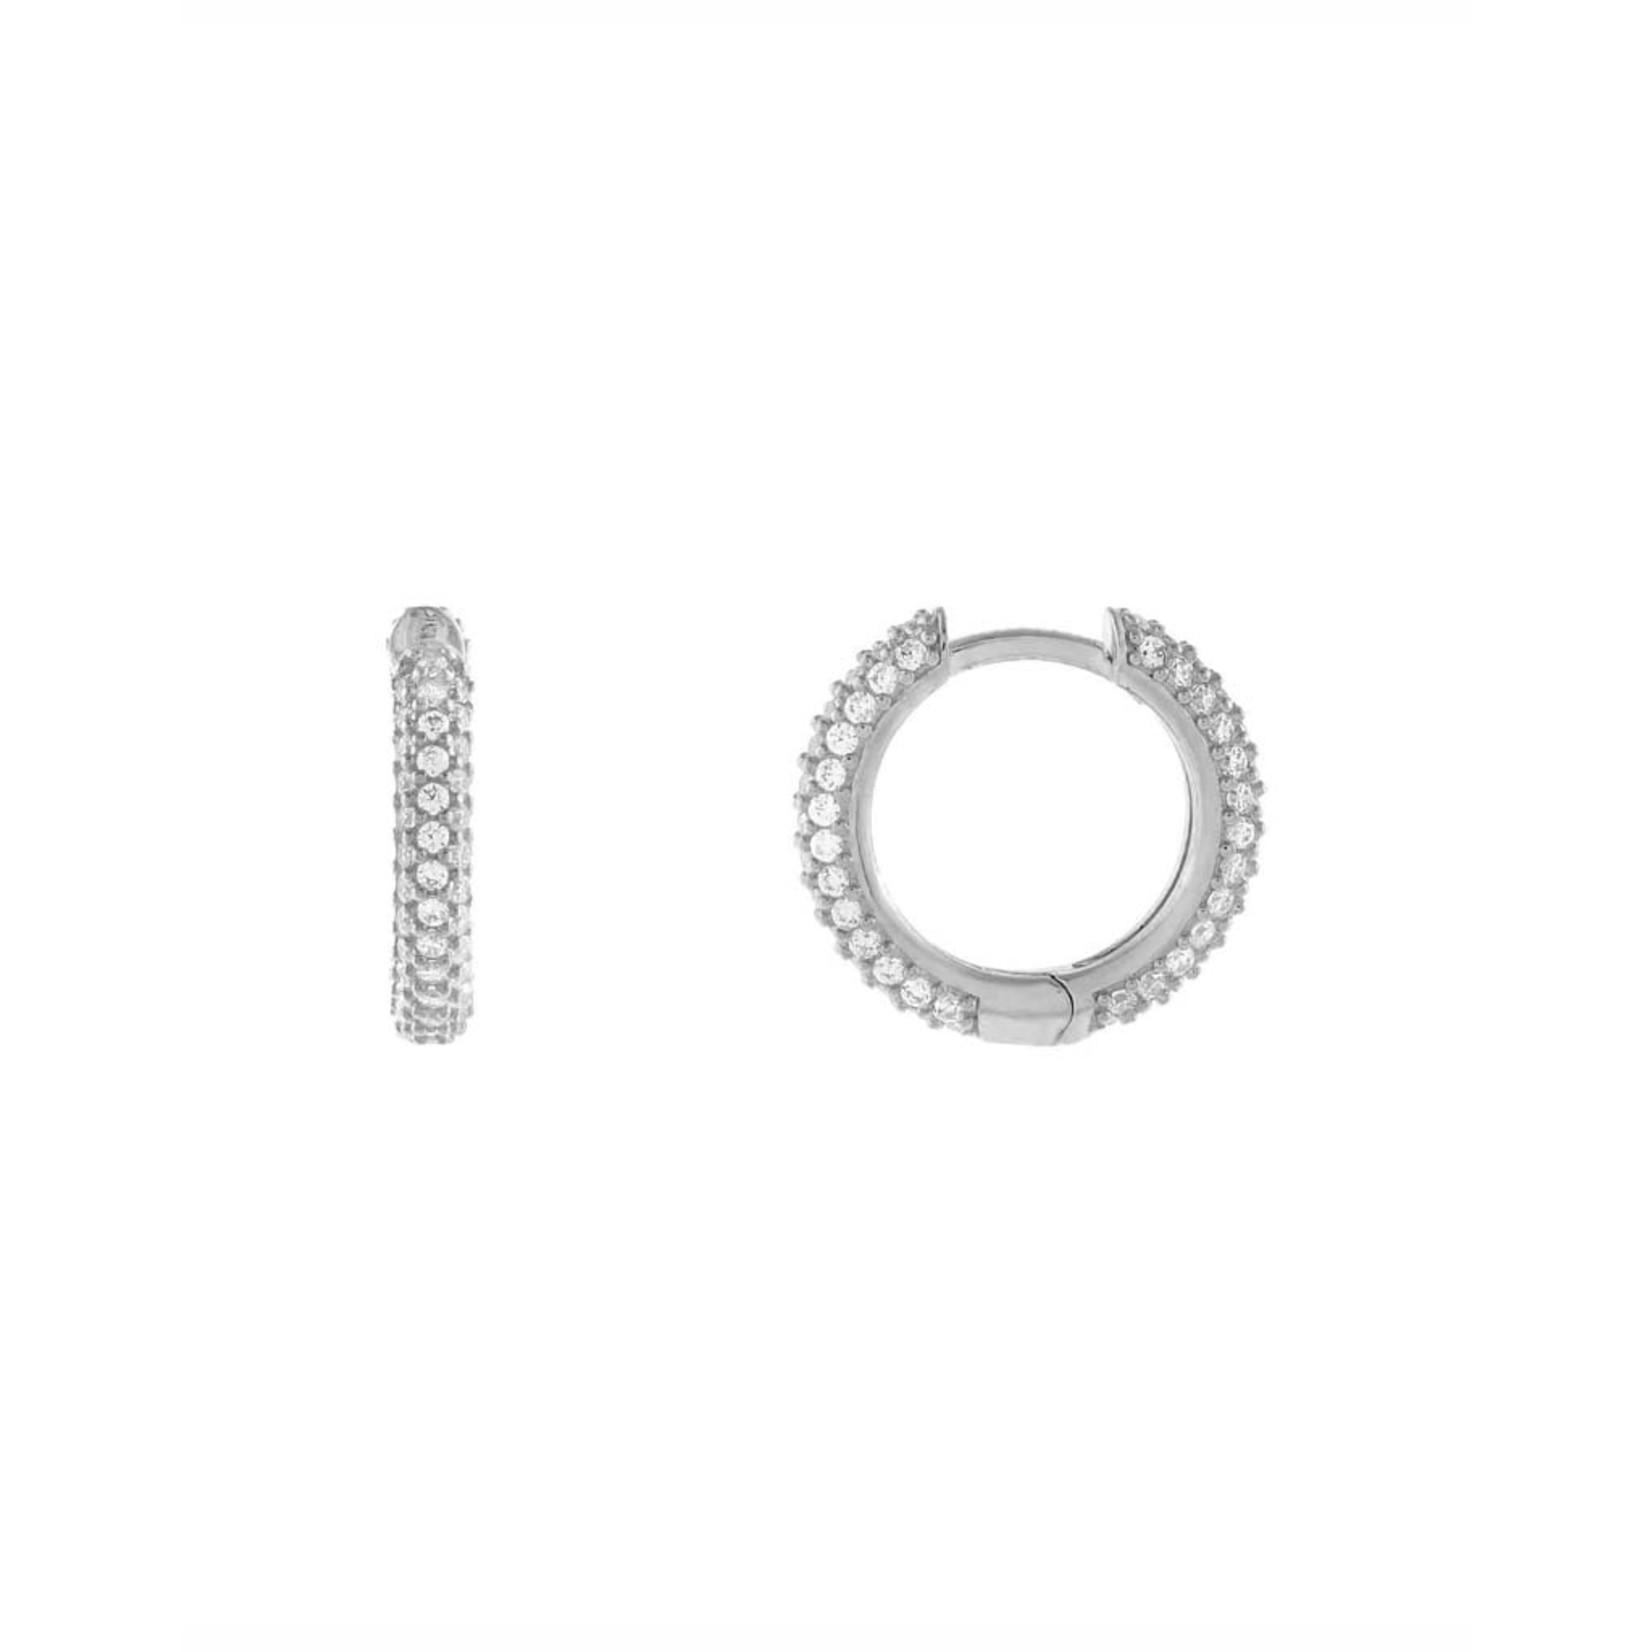 Adinas Pave Huggie Earrings Silver